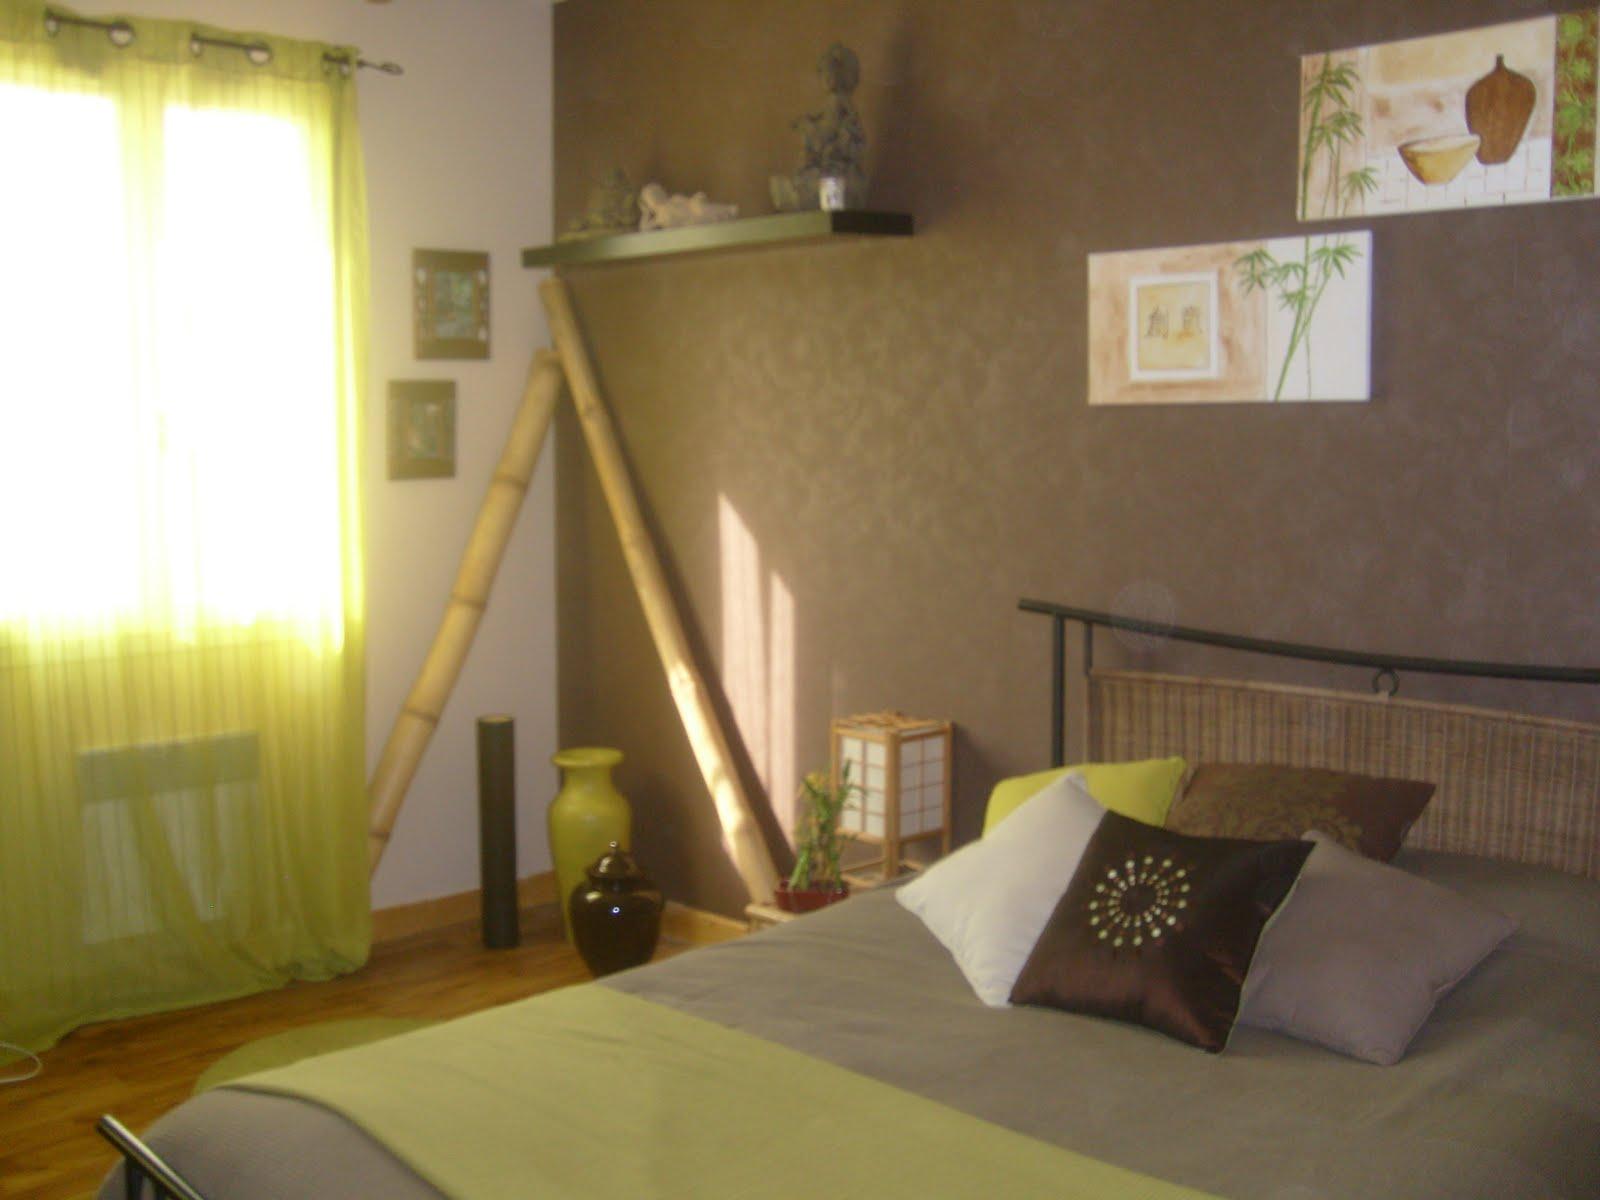 home staging du 17 chambre avant et apres d personnalisation. Black Bedroom Furniture Sets. Home Design Ideas